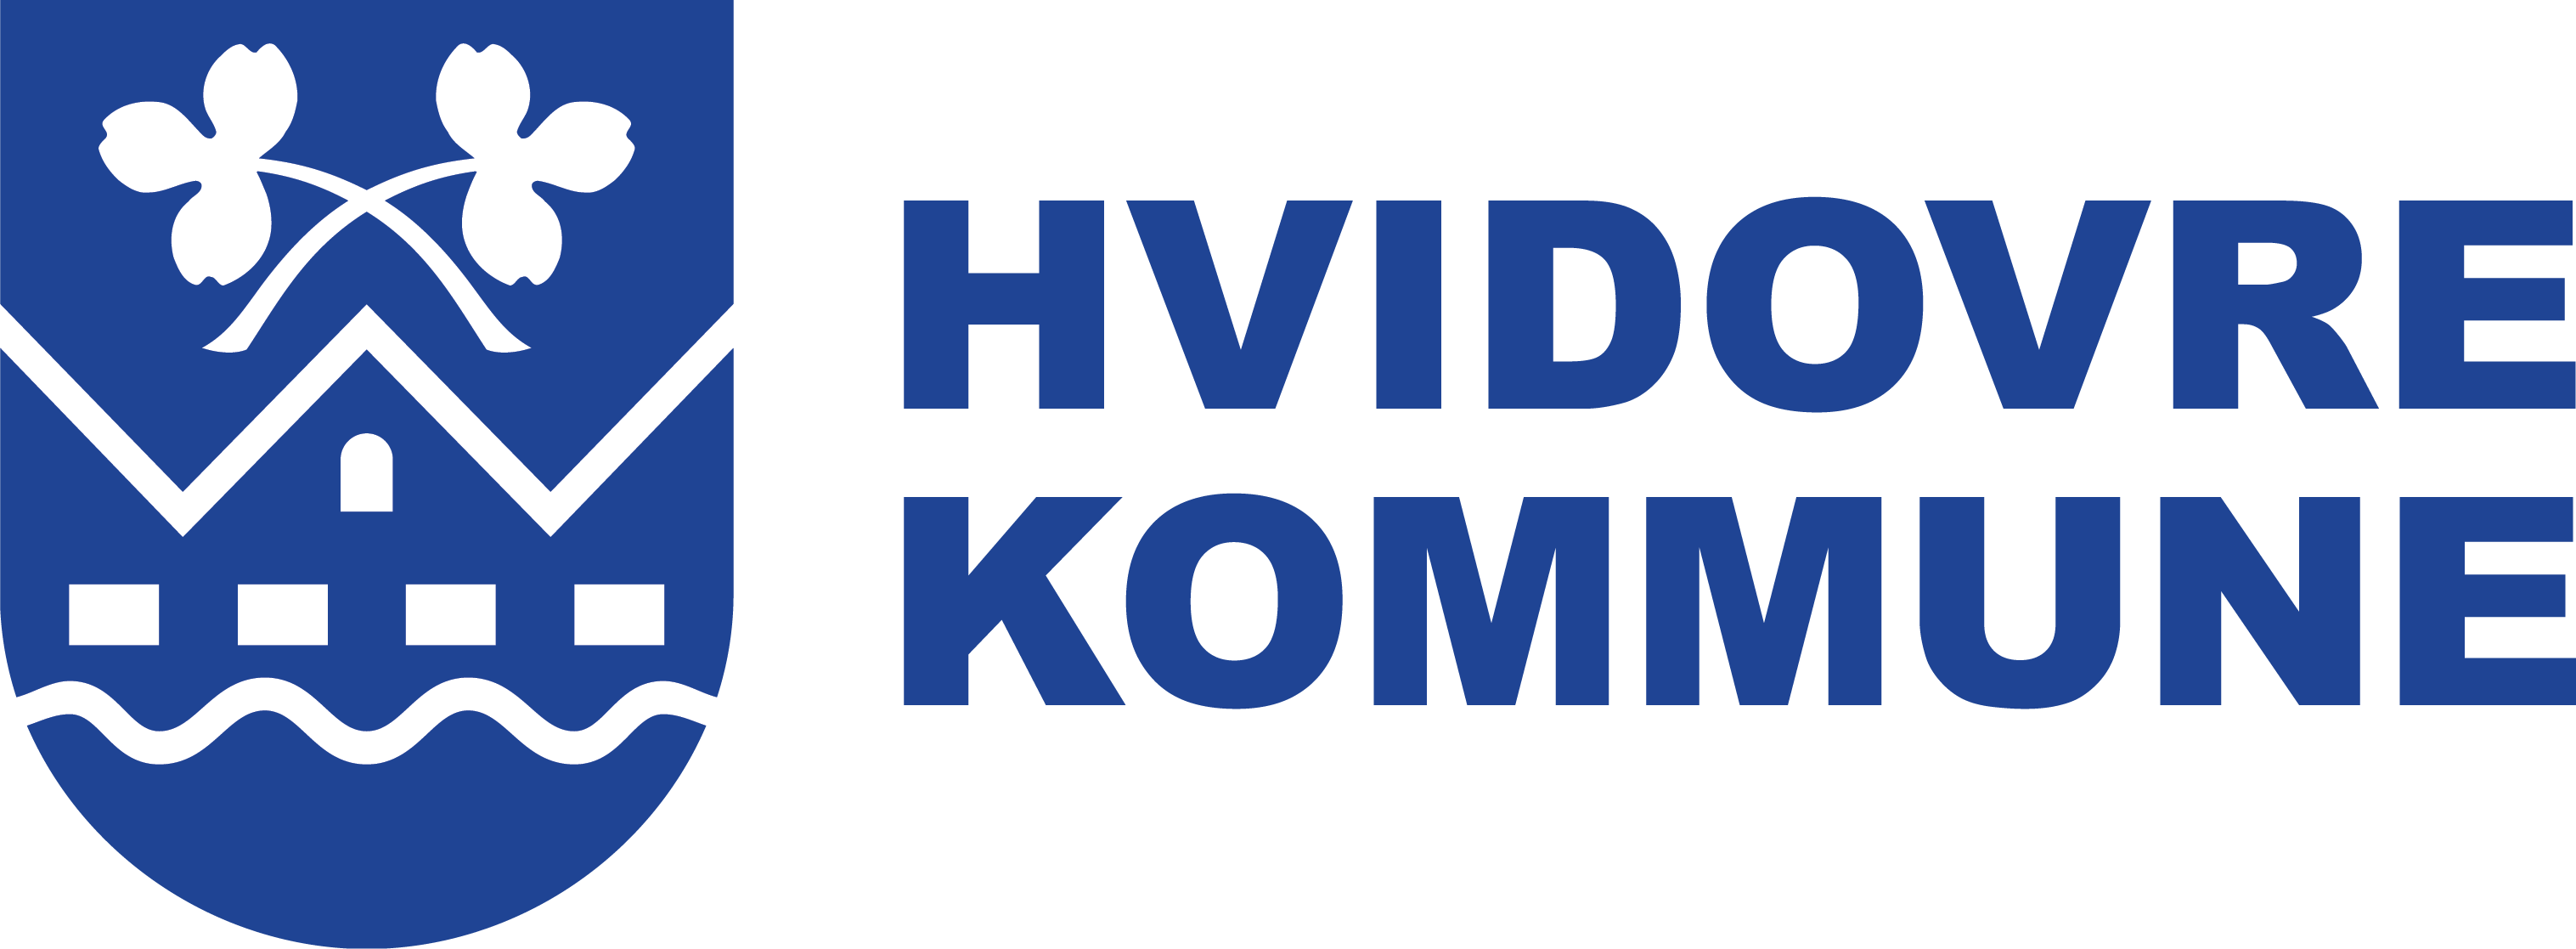 Hvidovre Kommune logo